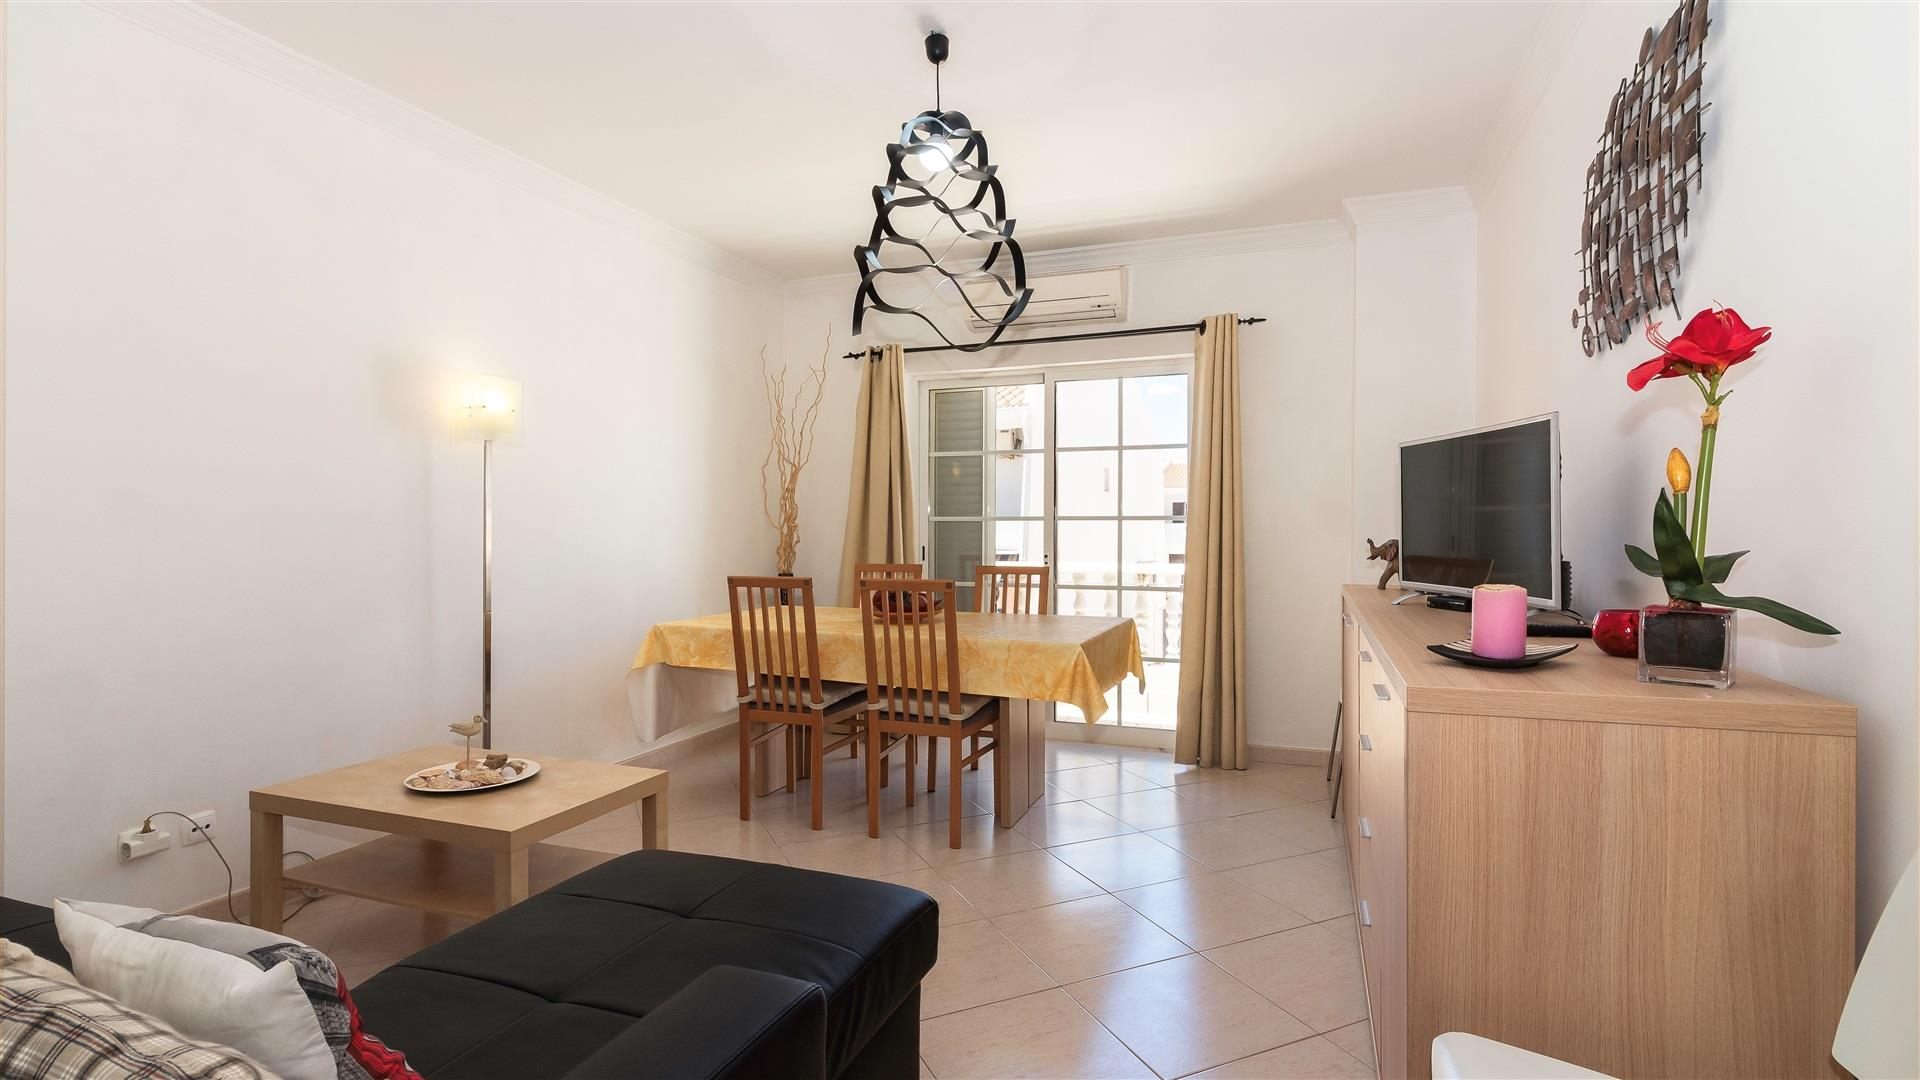 Appartamento in Villino 3 Vani  - Algarve, Manta Rota, Vila Real de Santo António